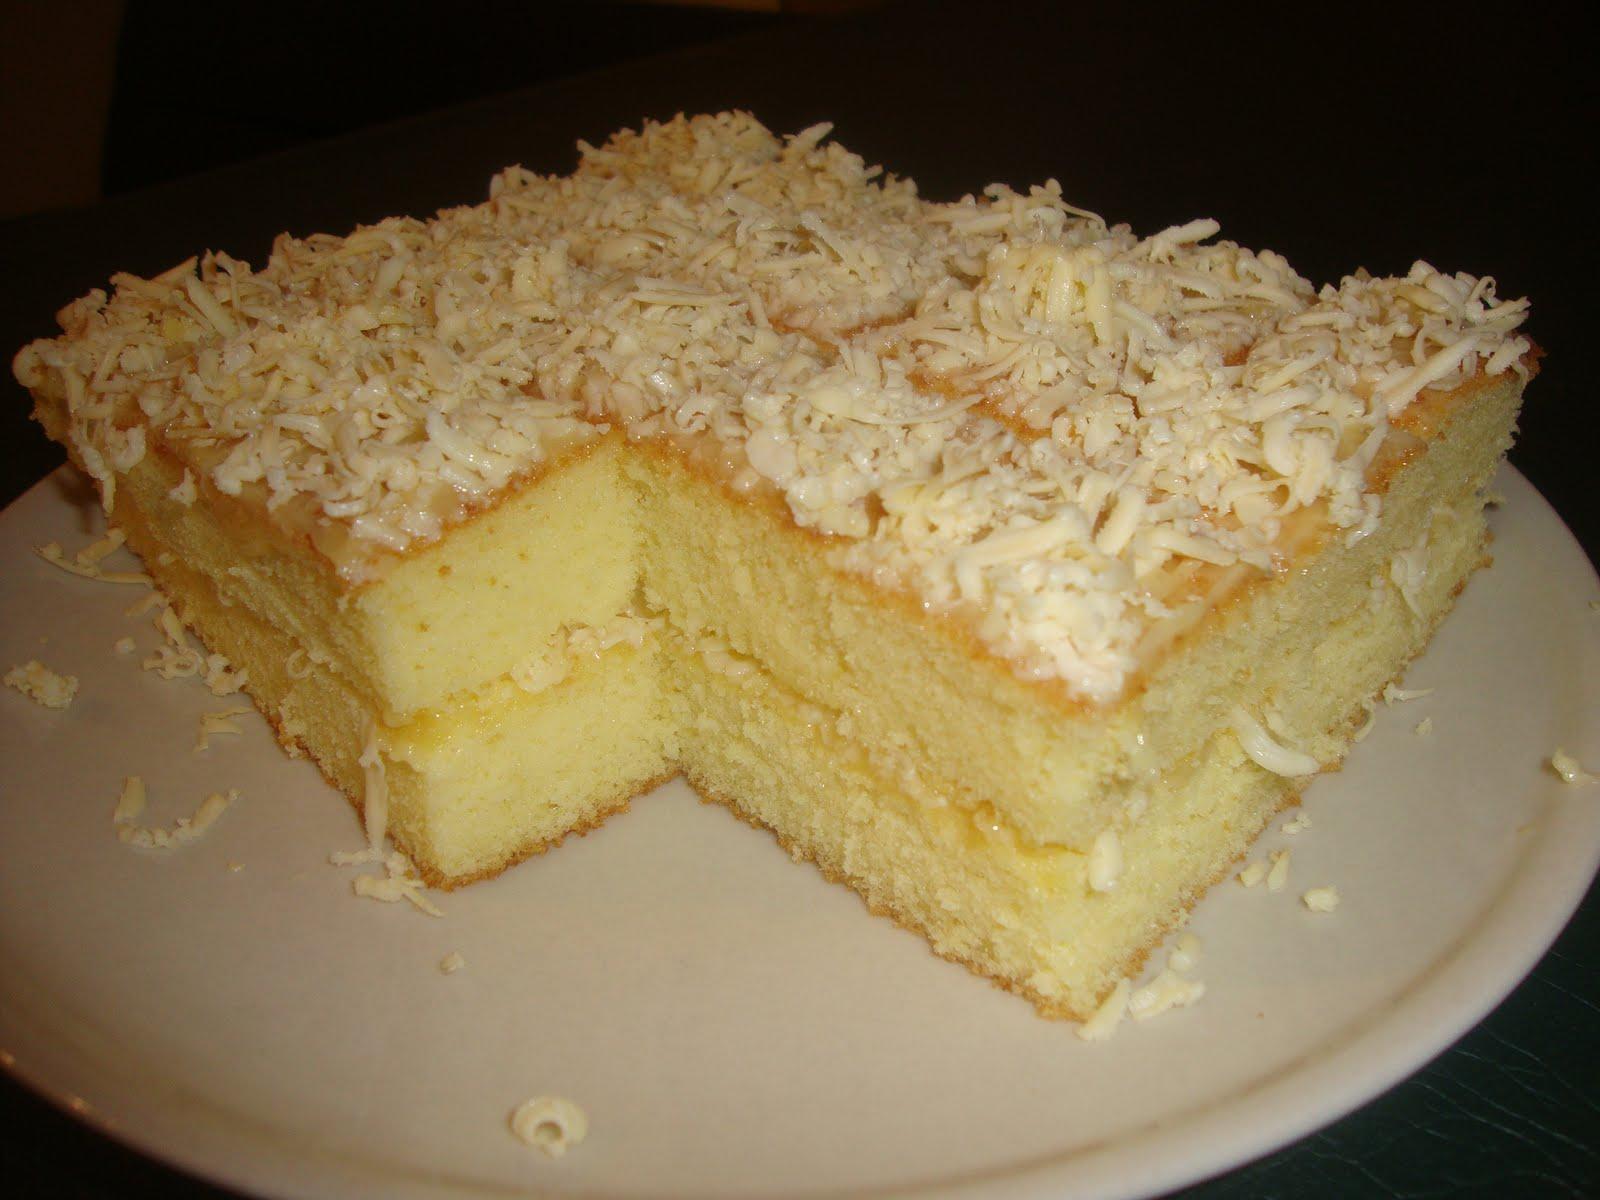 Resep Kue Bolu Keju